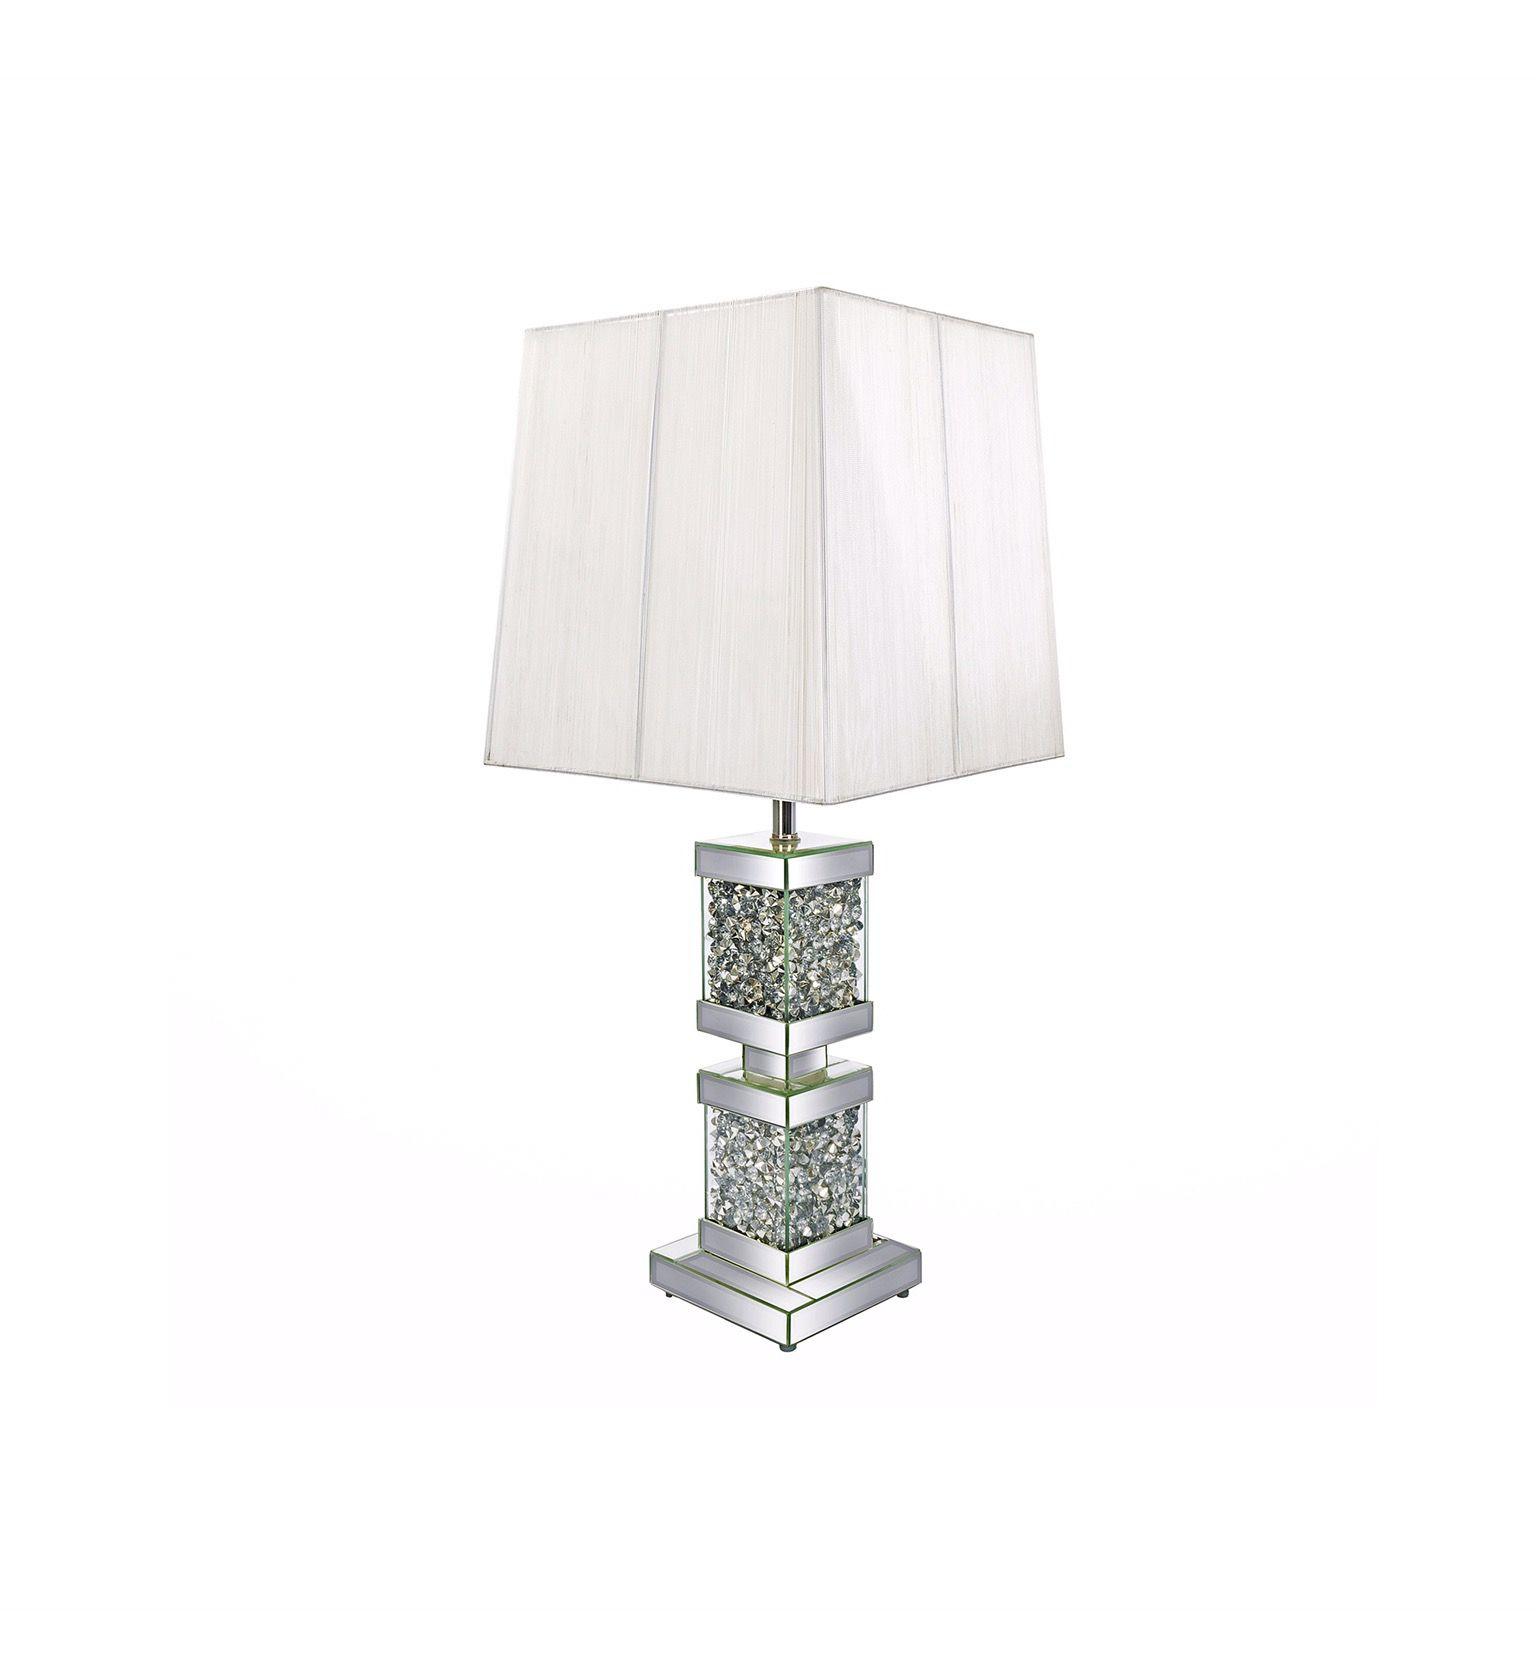 Diamond Crushed Mirror Tower Table Lamp Table lamp, Lamp